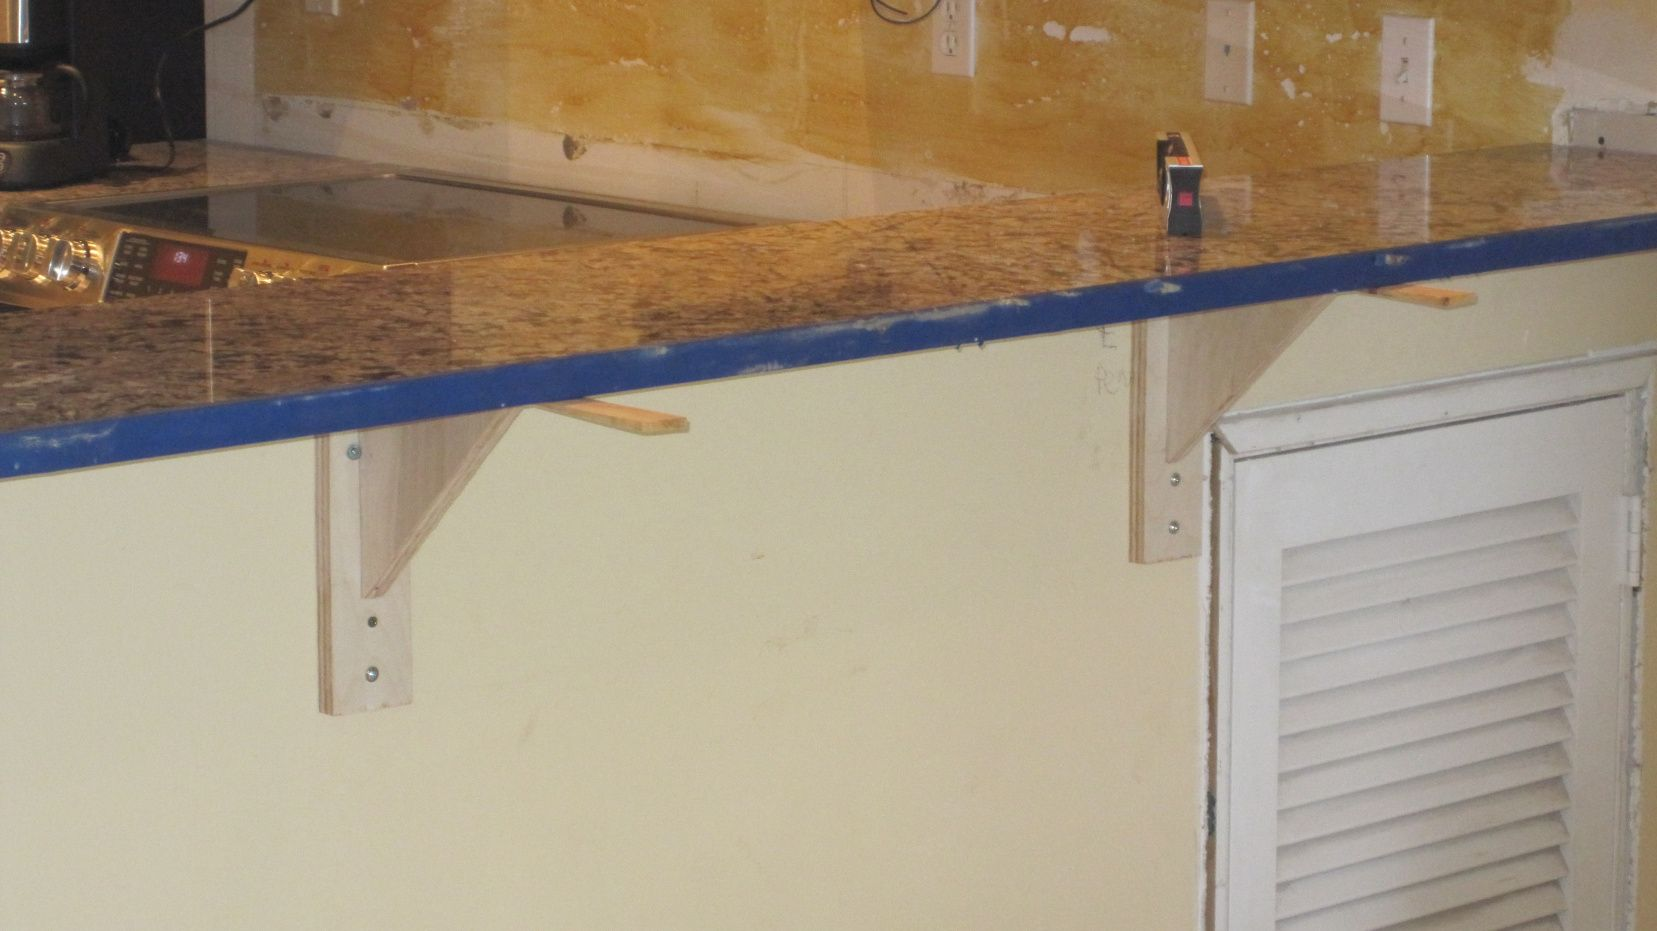 70 quartz countertop overhang limit kitchen island for Granite overhang limit